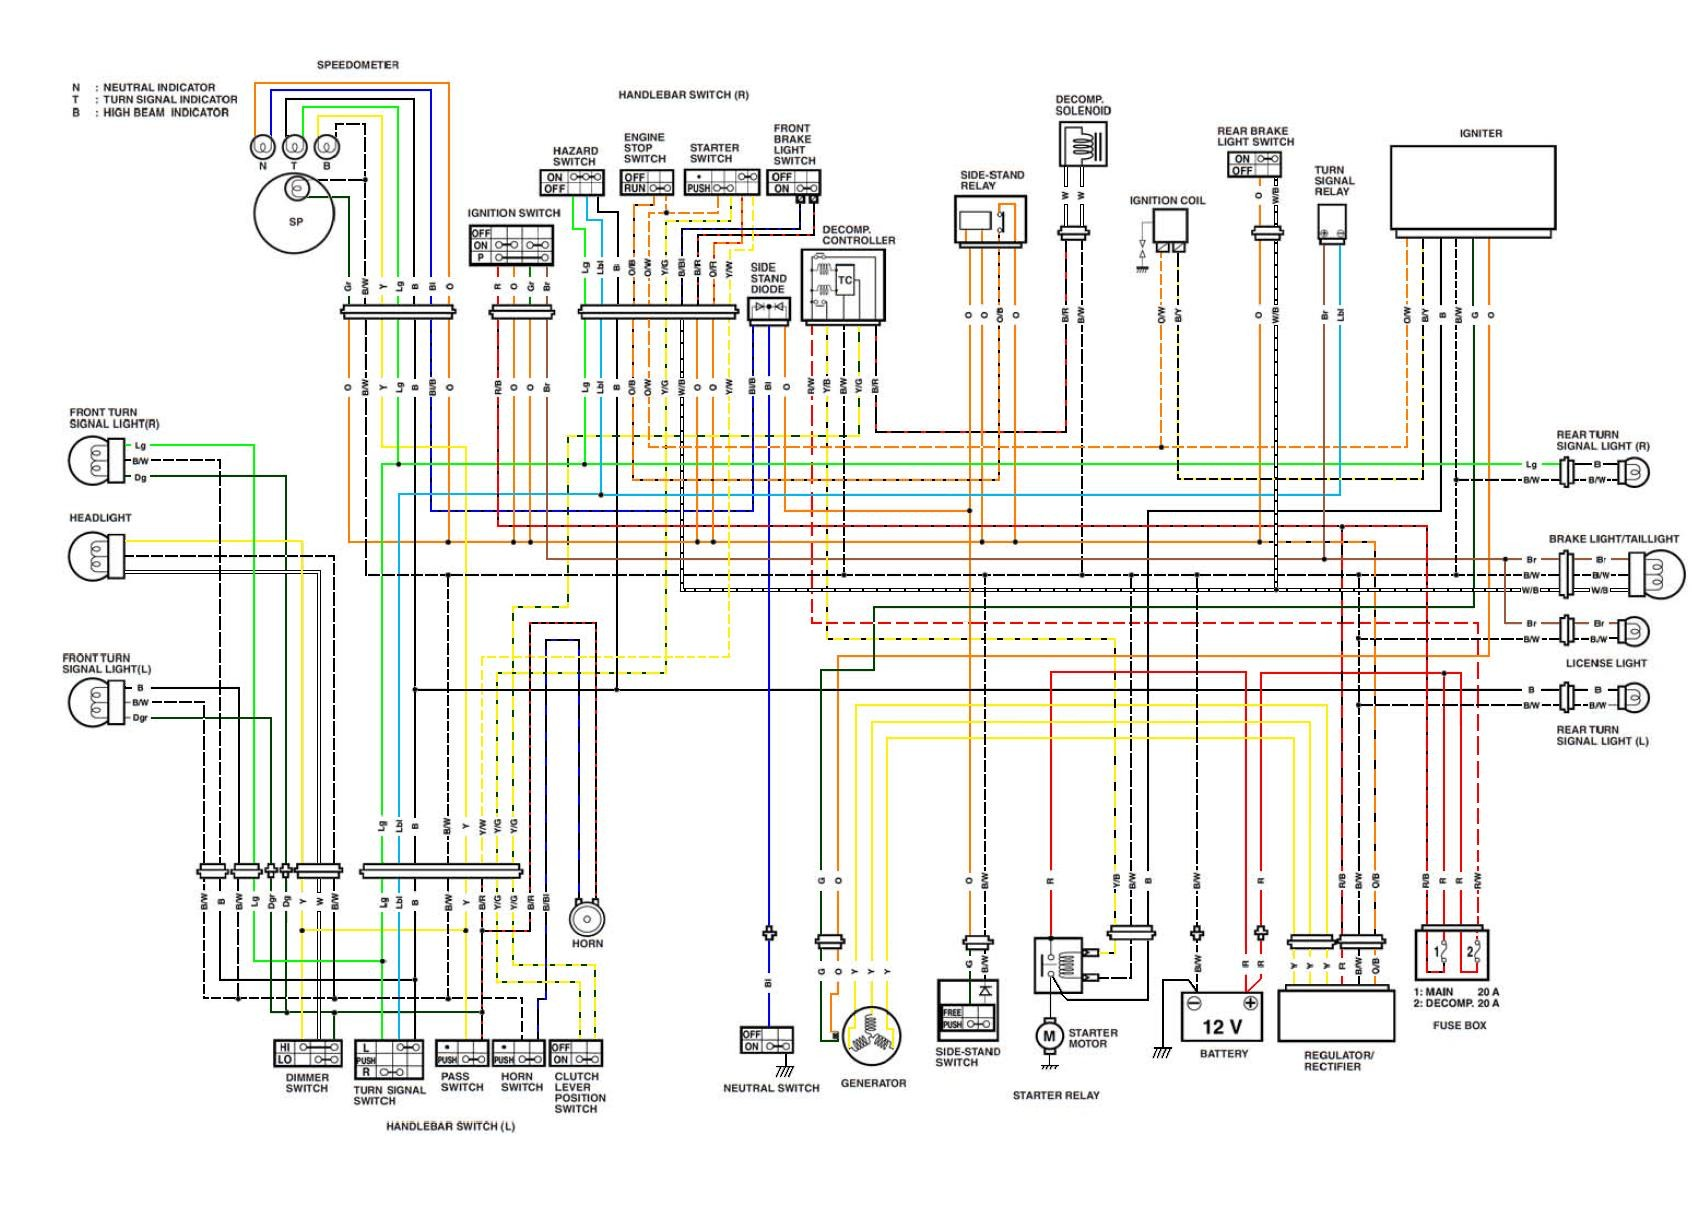 harley headlight wiring 81 free download diagram schematic library2001 harley davidson wiring diagram schematic diagram harley headlight wiring 81 free download diagram schematic